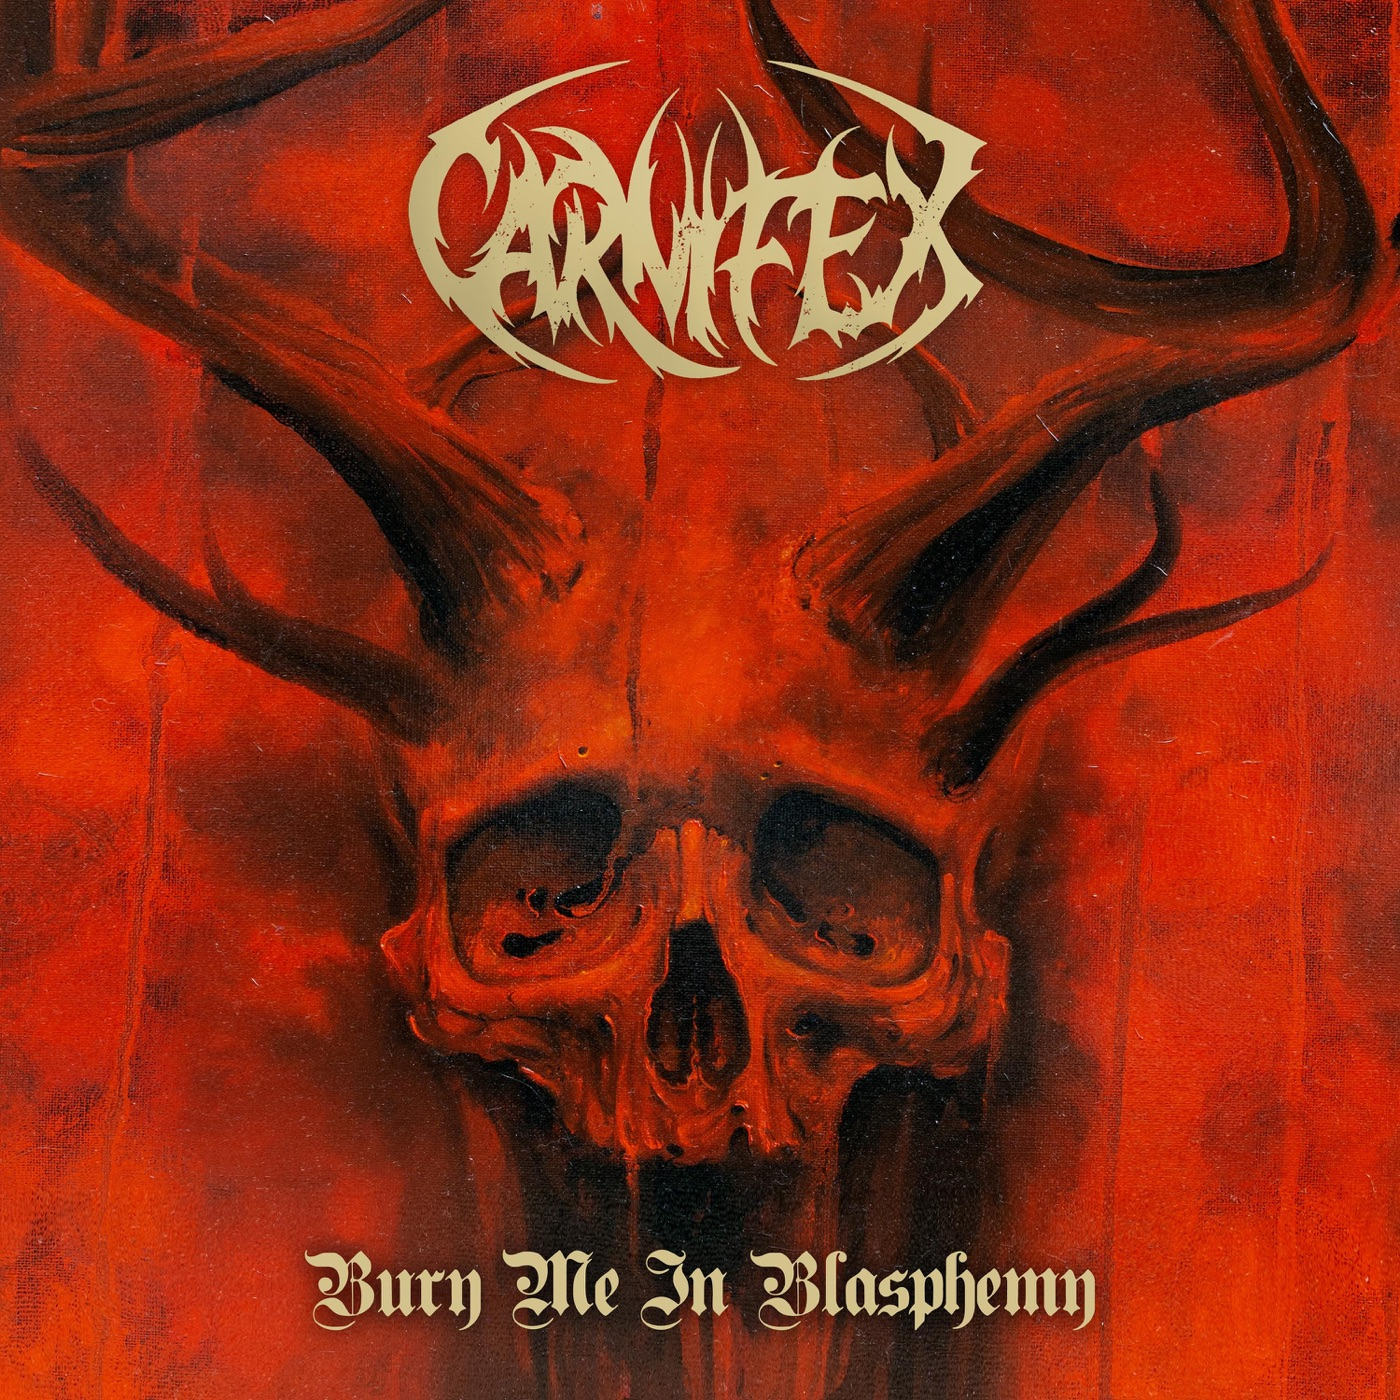 Carnifex - Bury Me In Blasphemy [EP] (2018)